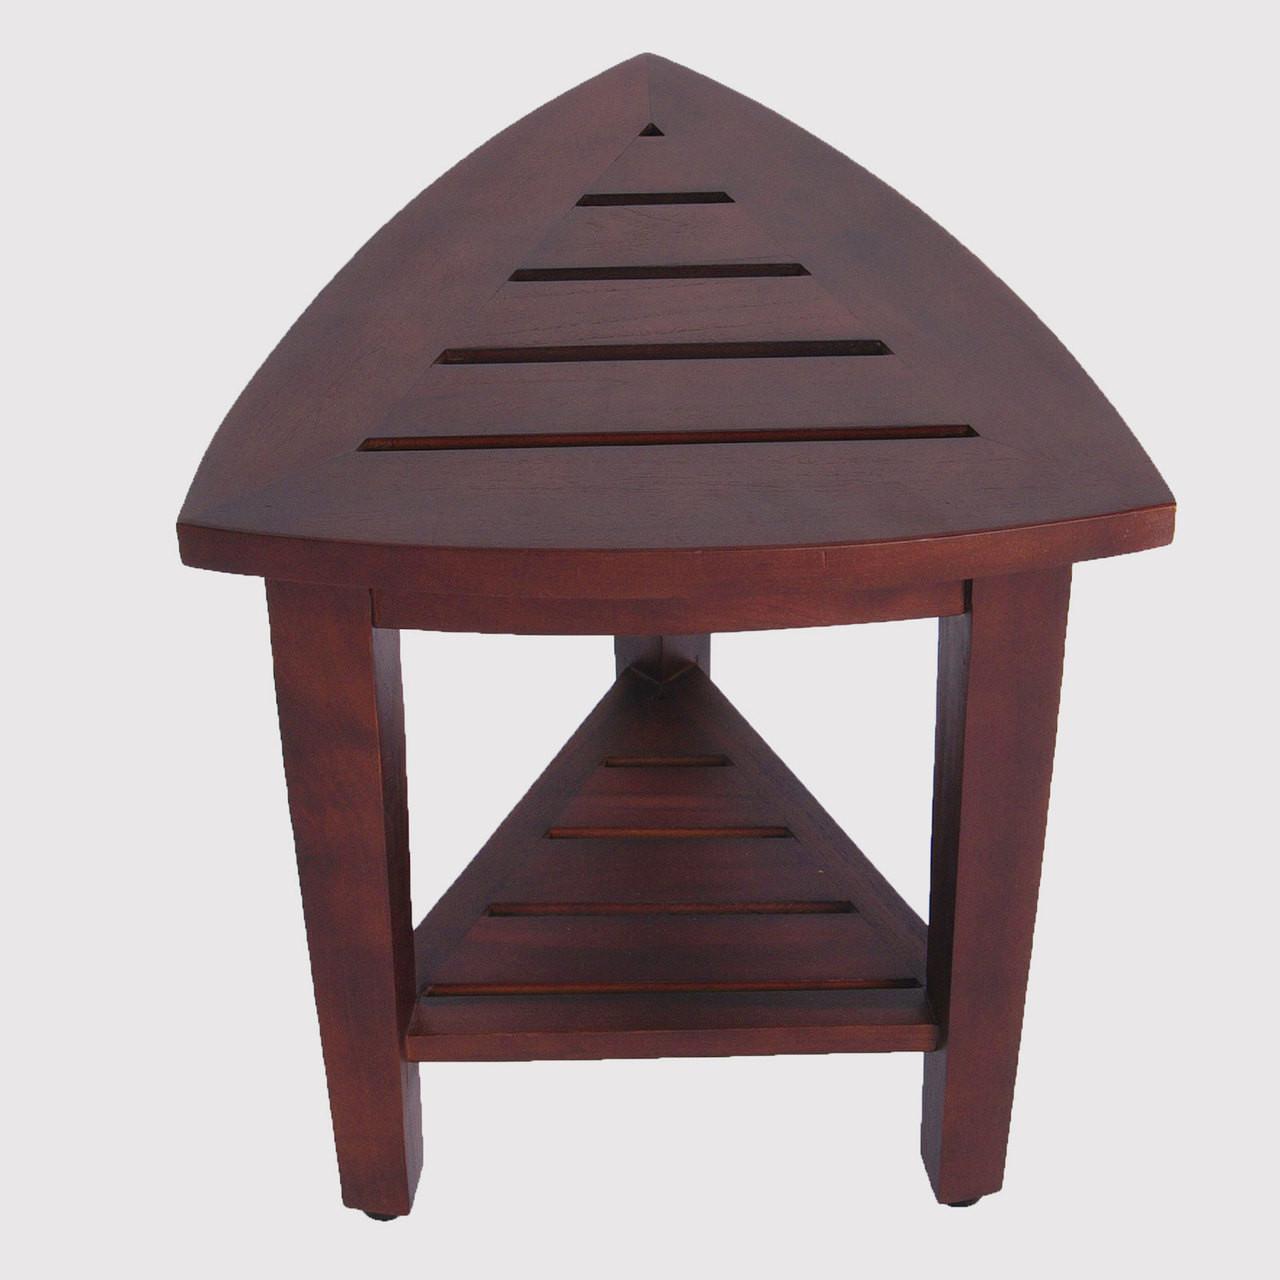 Decoteak corner shower stool DT163